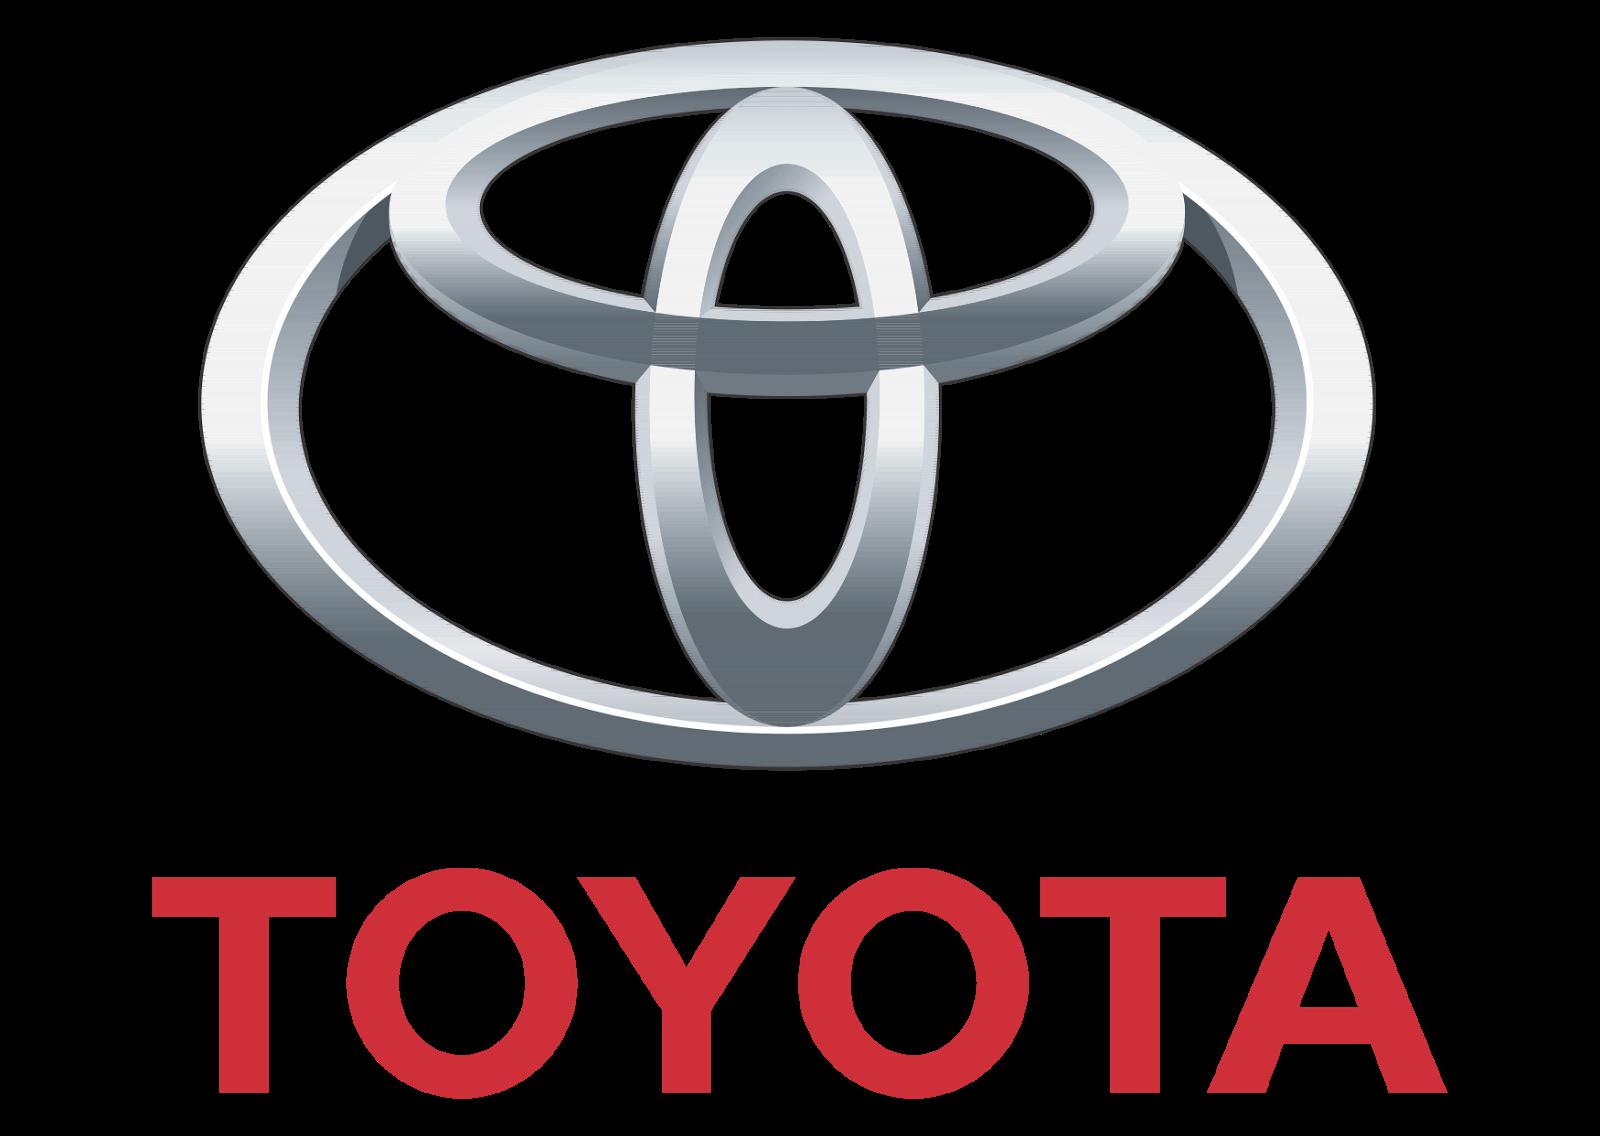 Toyota Logo Free Download Png PNG Image - Toyota PNG - Toyota Rav4 Logo Vector PNG